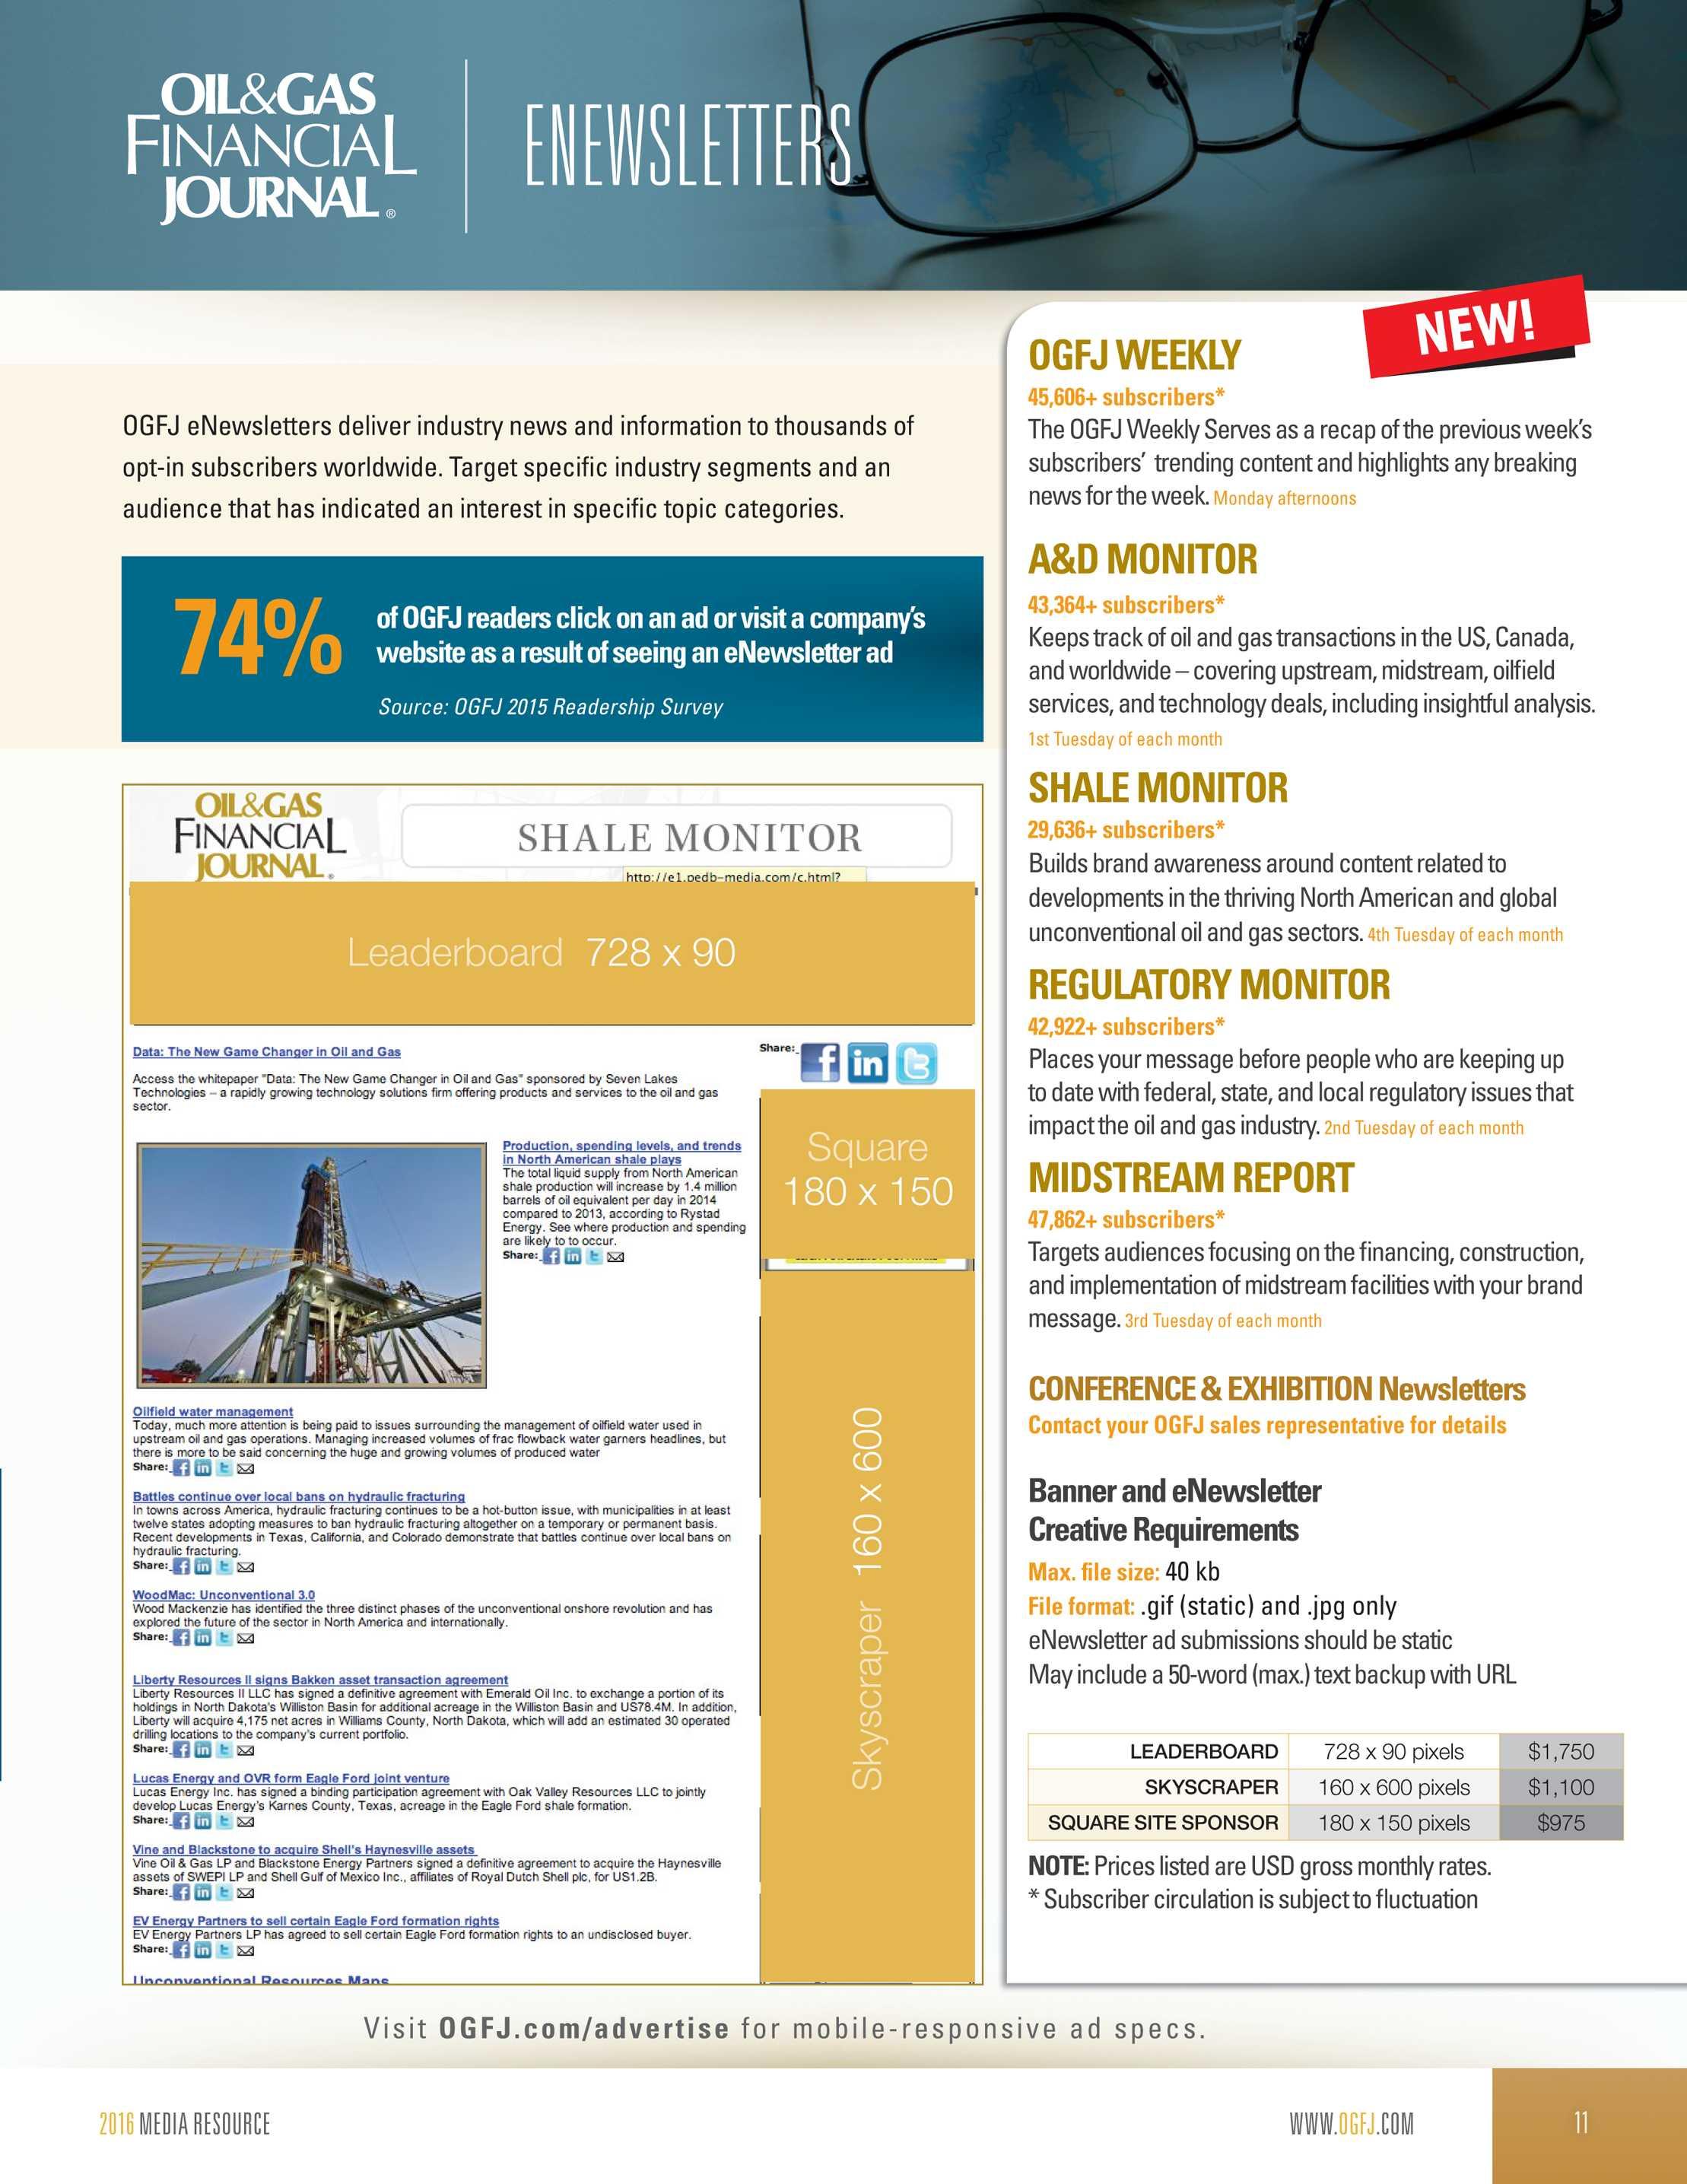 Pennwell Supplements - Oil & Gas Financial Journal 2016 Media Kit